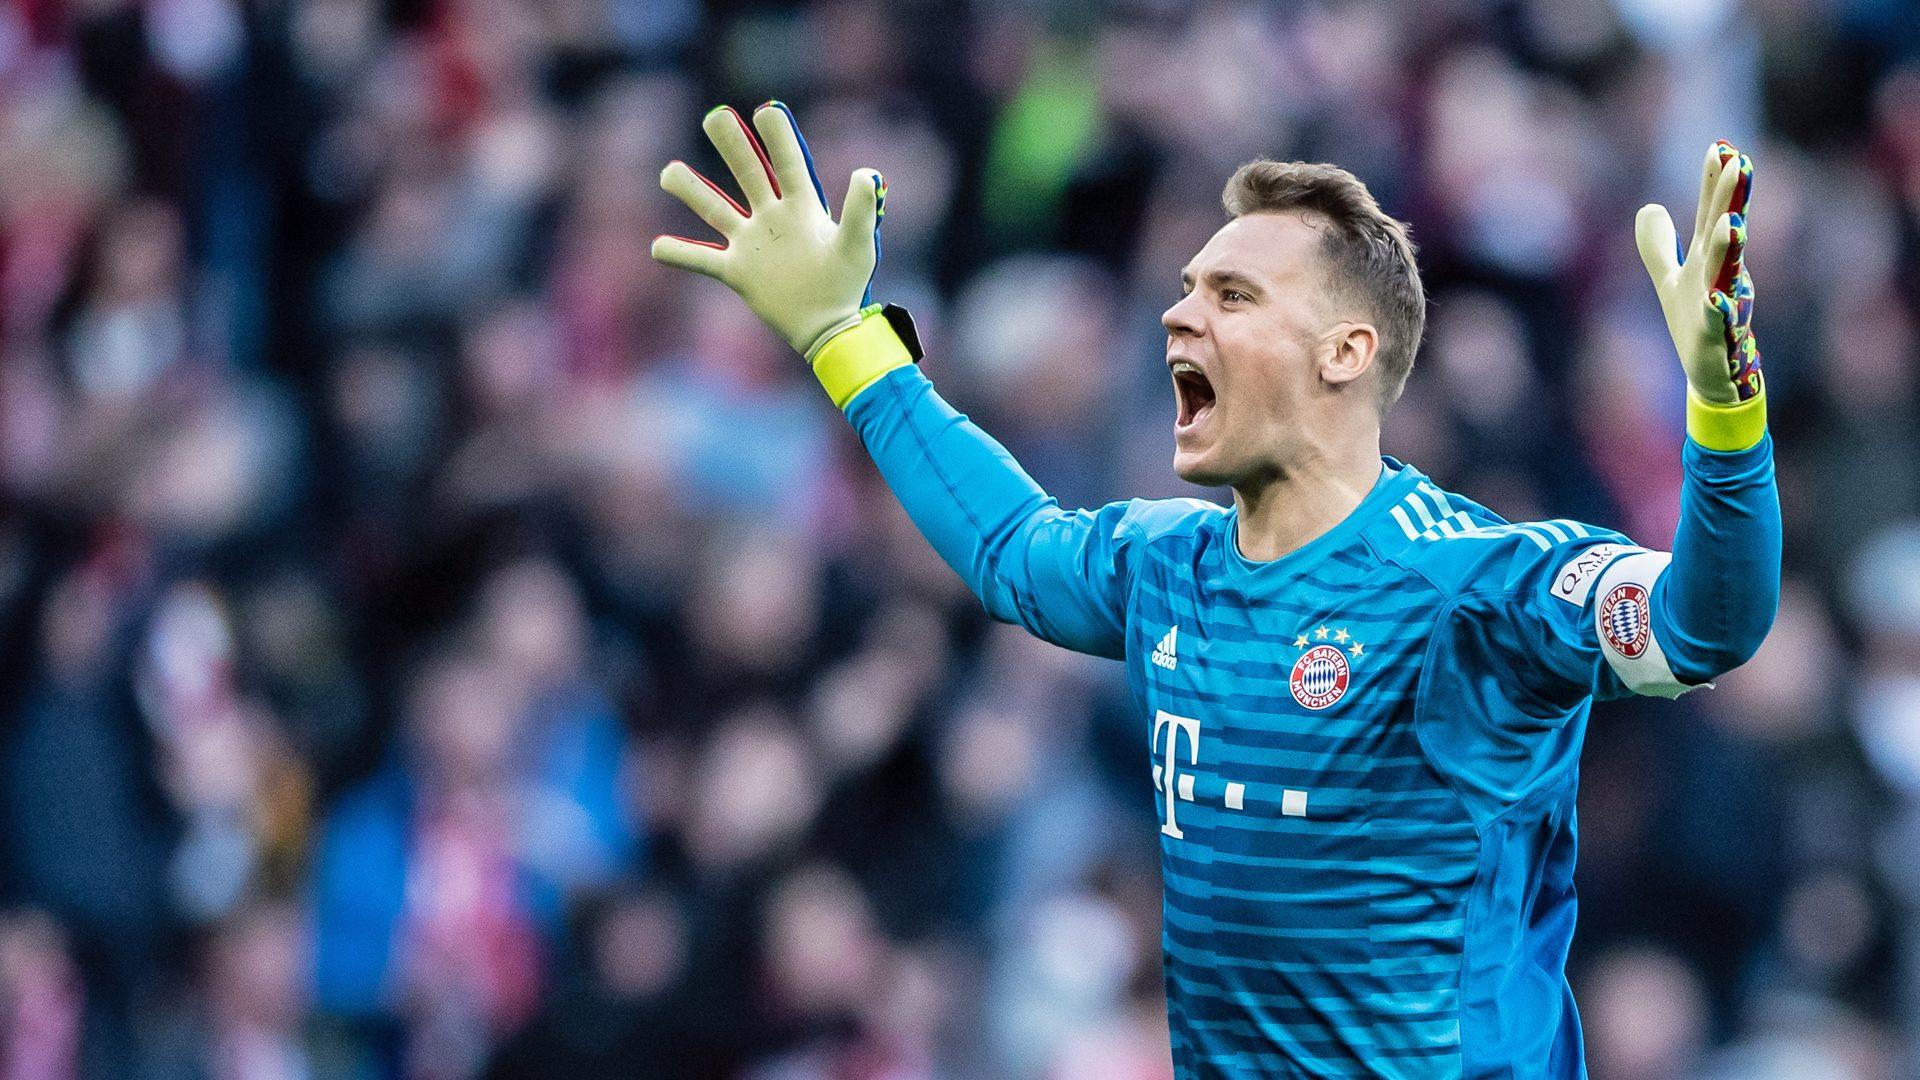 da44daac189 Bundesliga | Manuel Neuer: 10 things on the Bayern Munich and ...